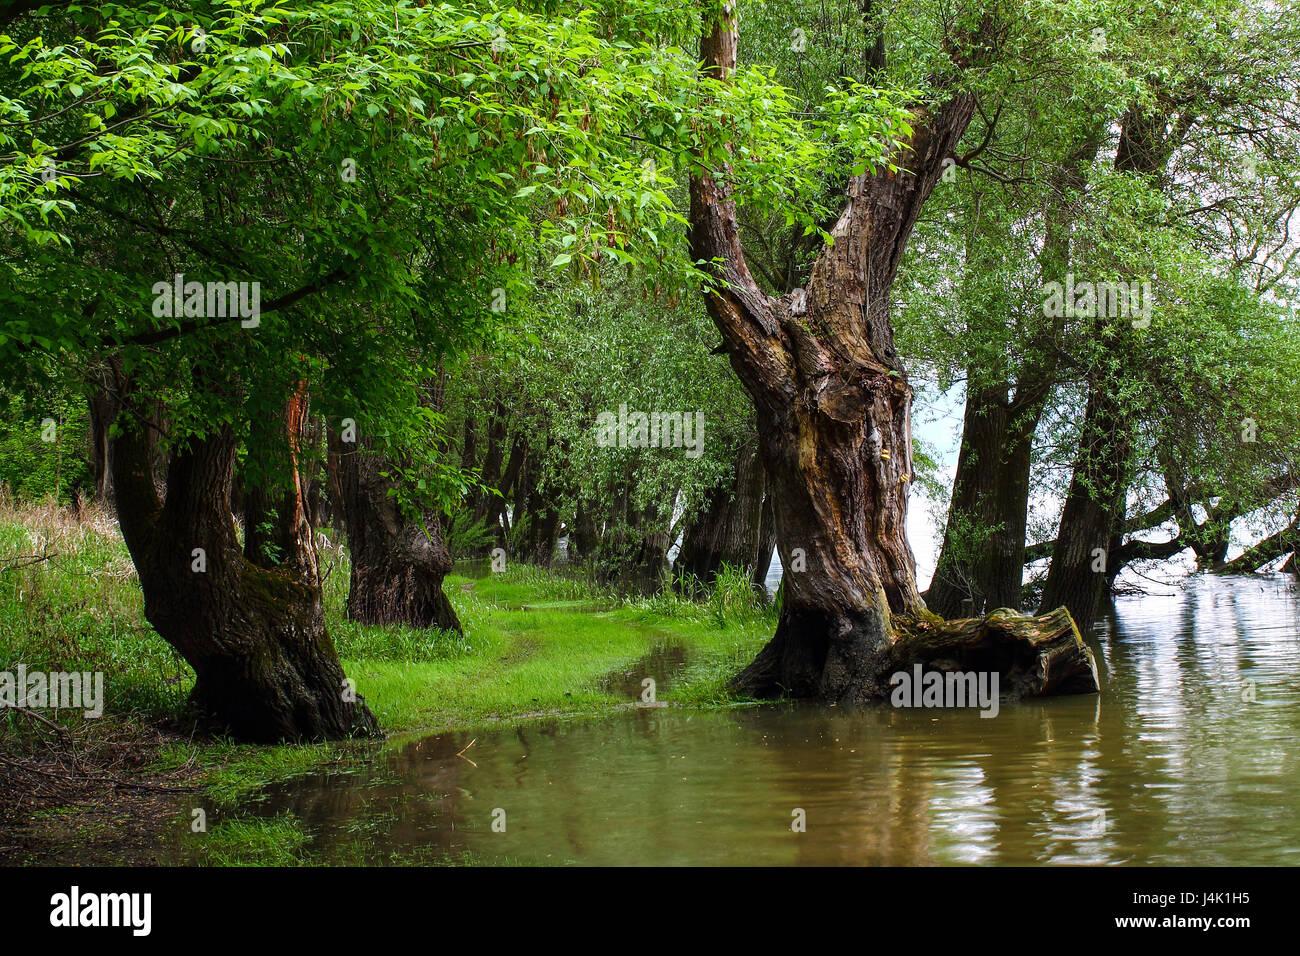 Flood basin - Danube Hungary - Waterside - Stock Image